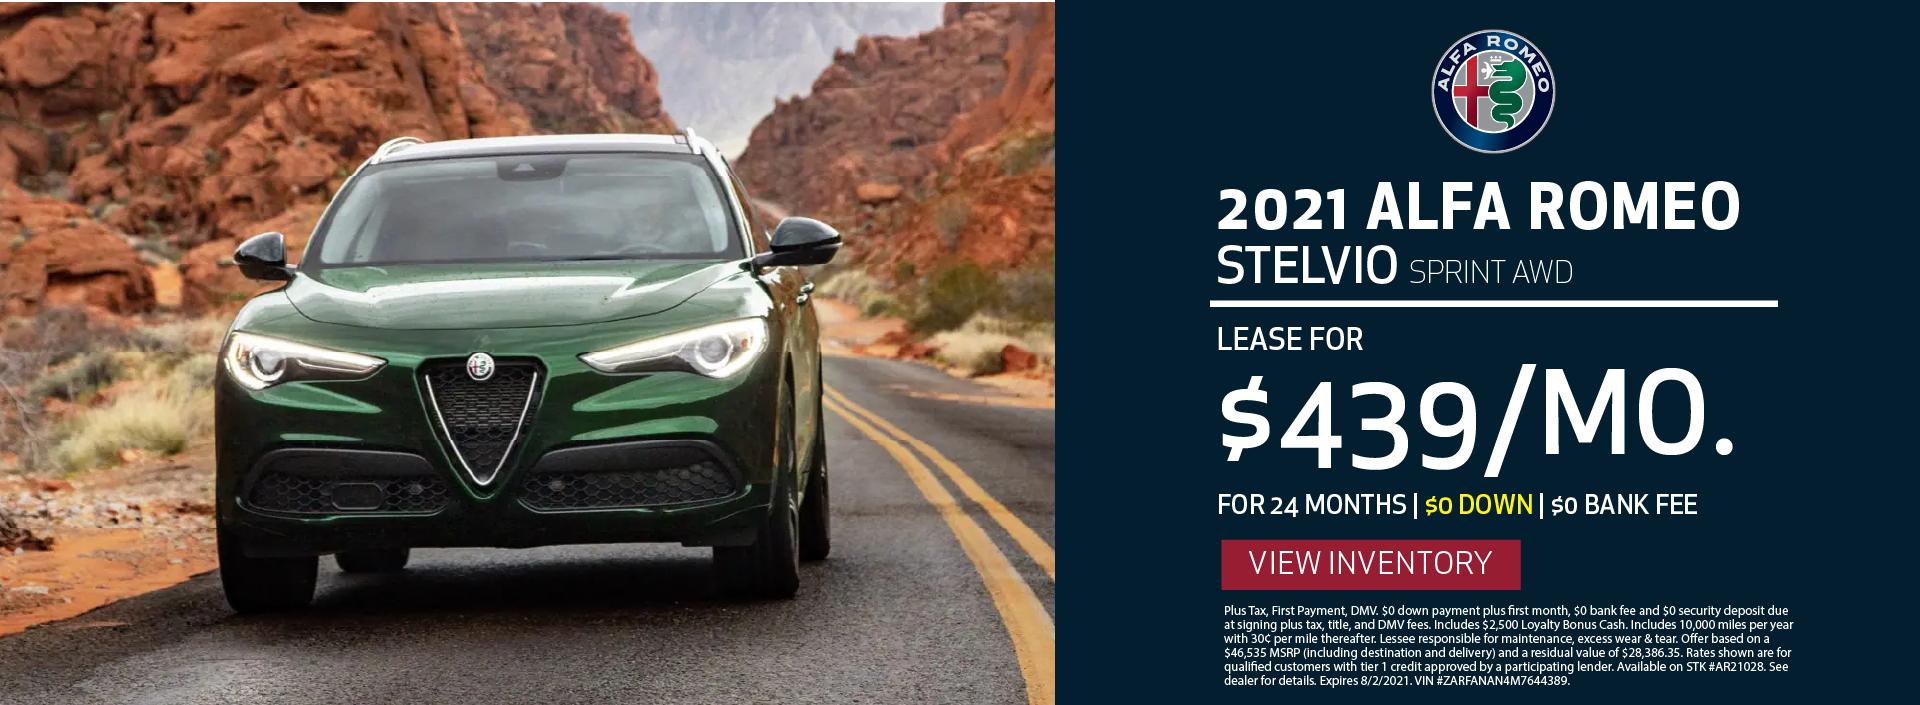 Manhattan Alfa Romeo – 2021 Stelvio Sprint – July 2021